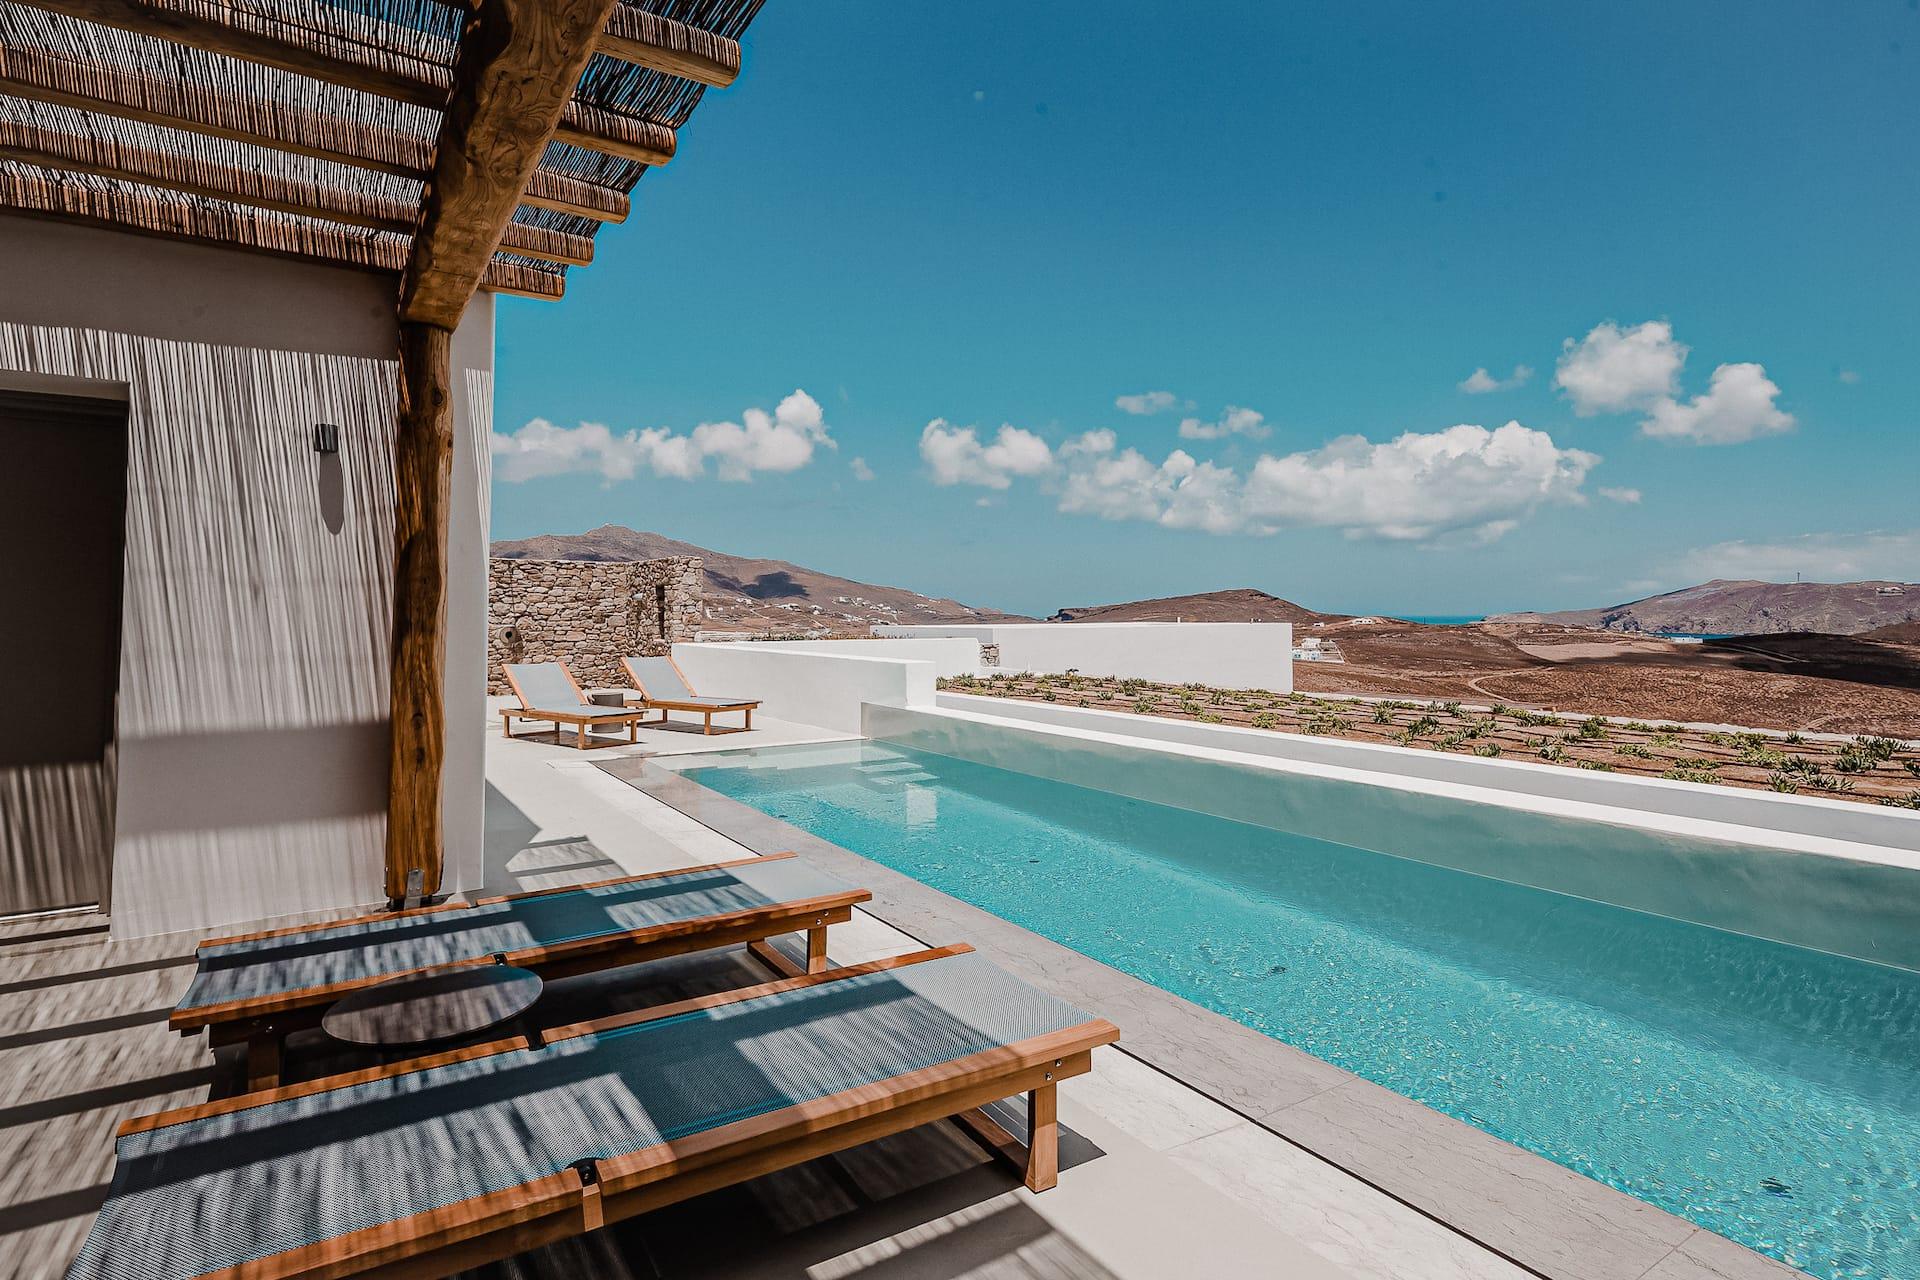 The villa Iris private terrace and outdoor pool. A 1 bedroom luxury villa in Ftelia, Mykonos.